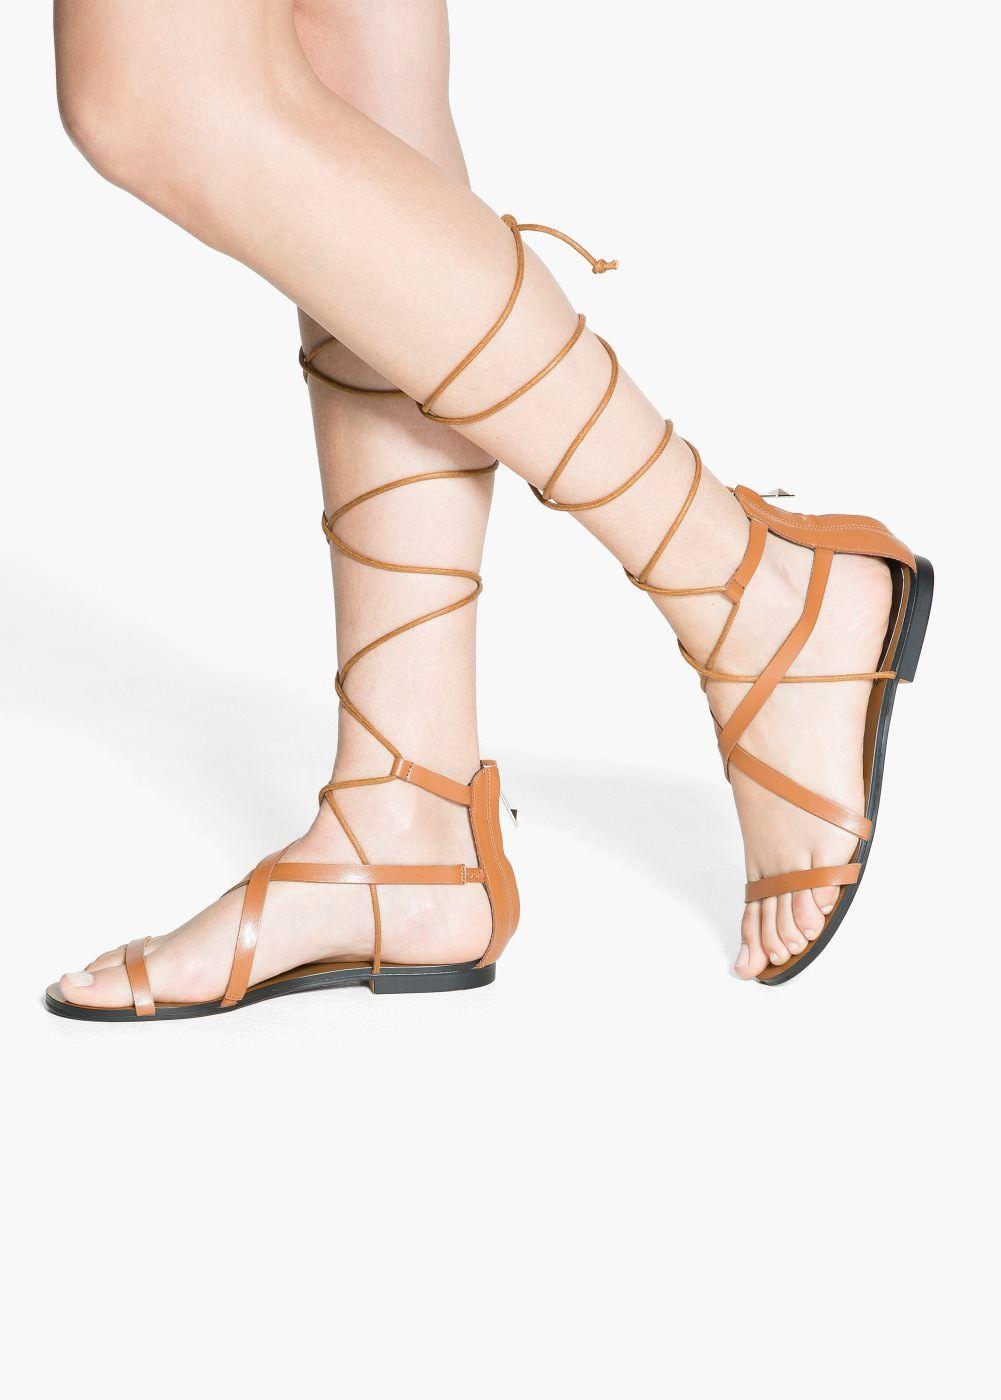 6db51435a1 Sandalia tiras cordón - Mujer